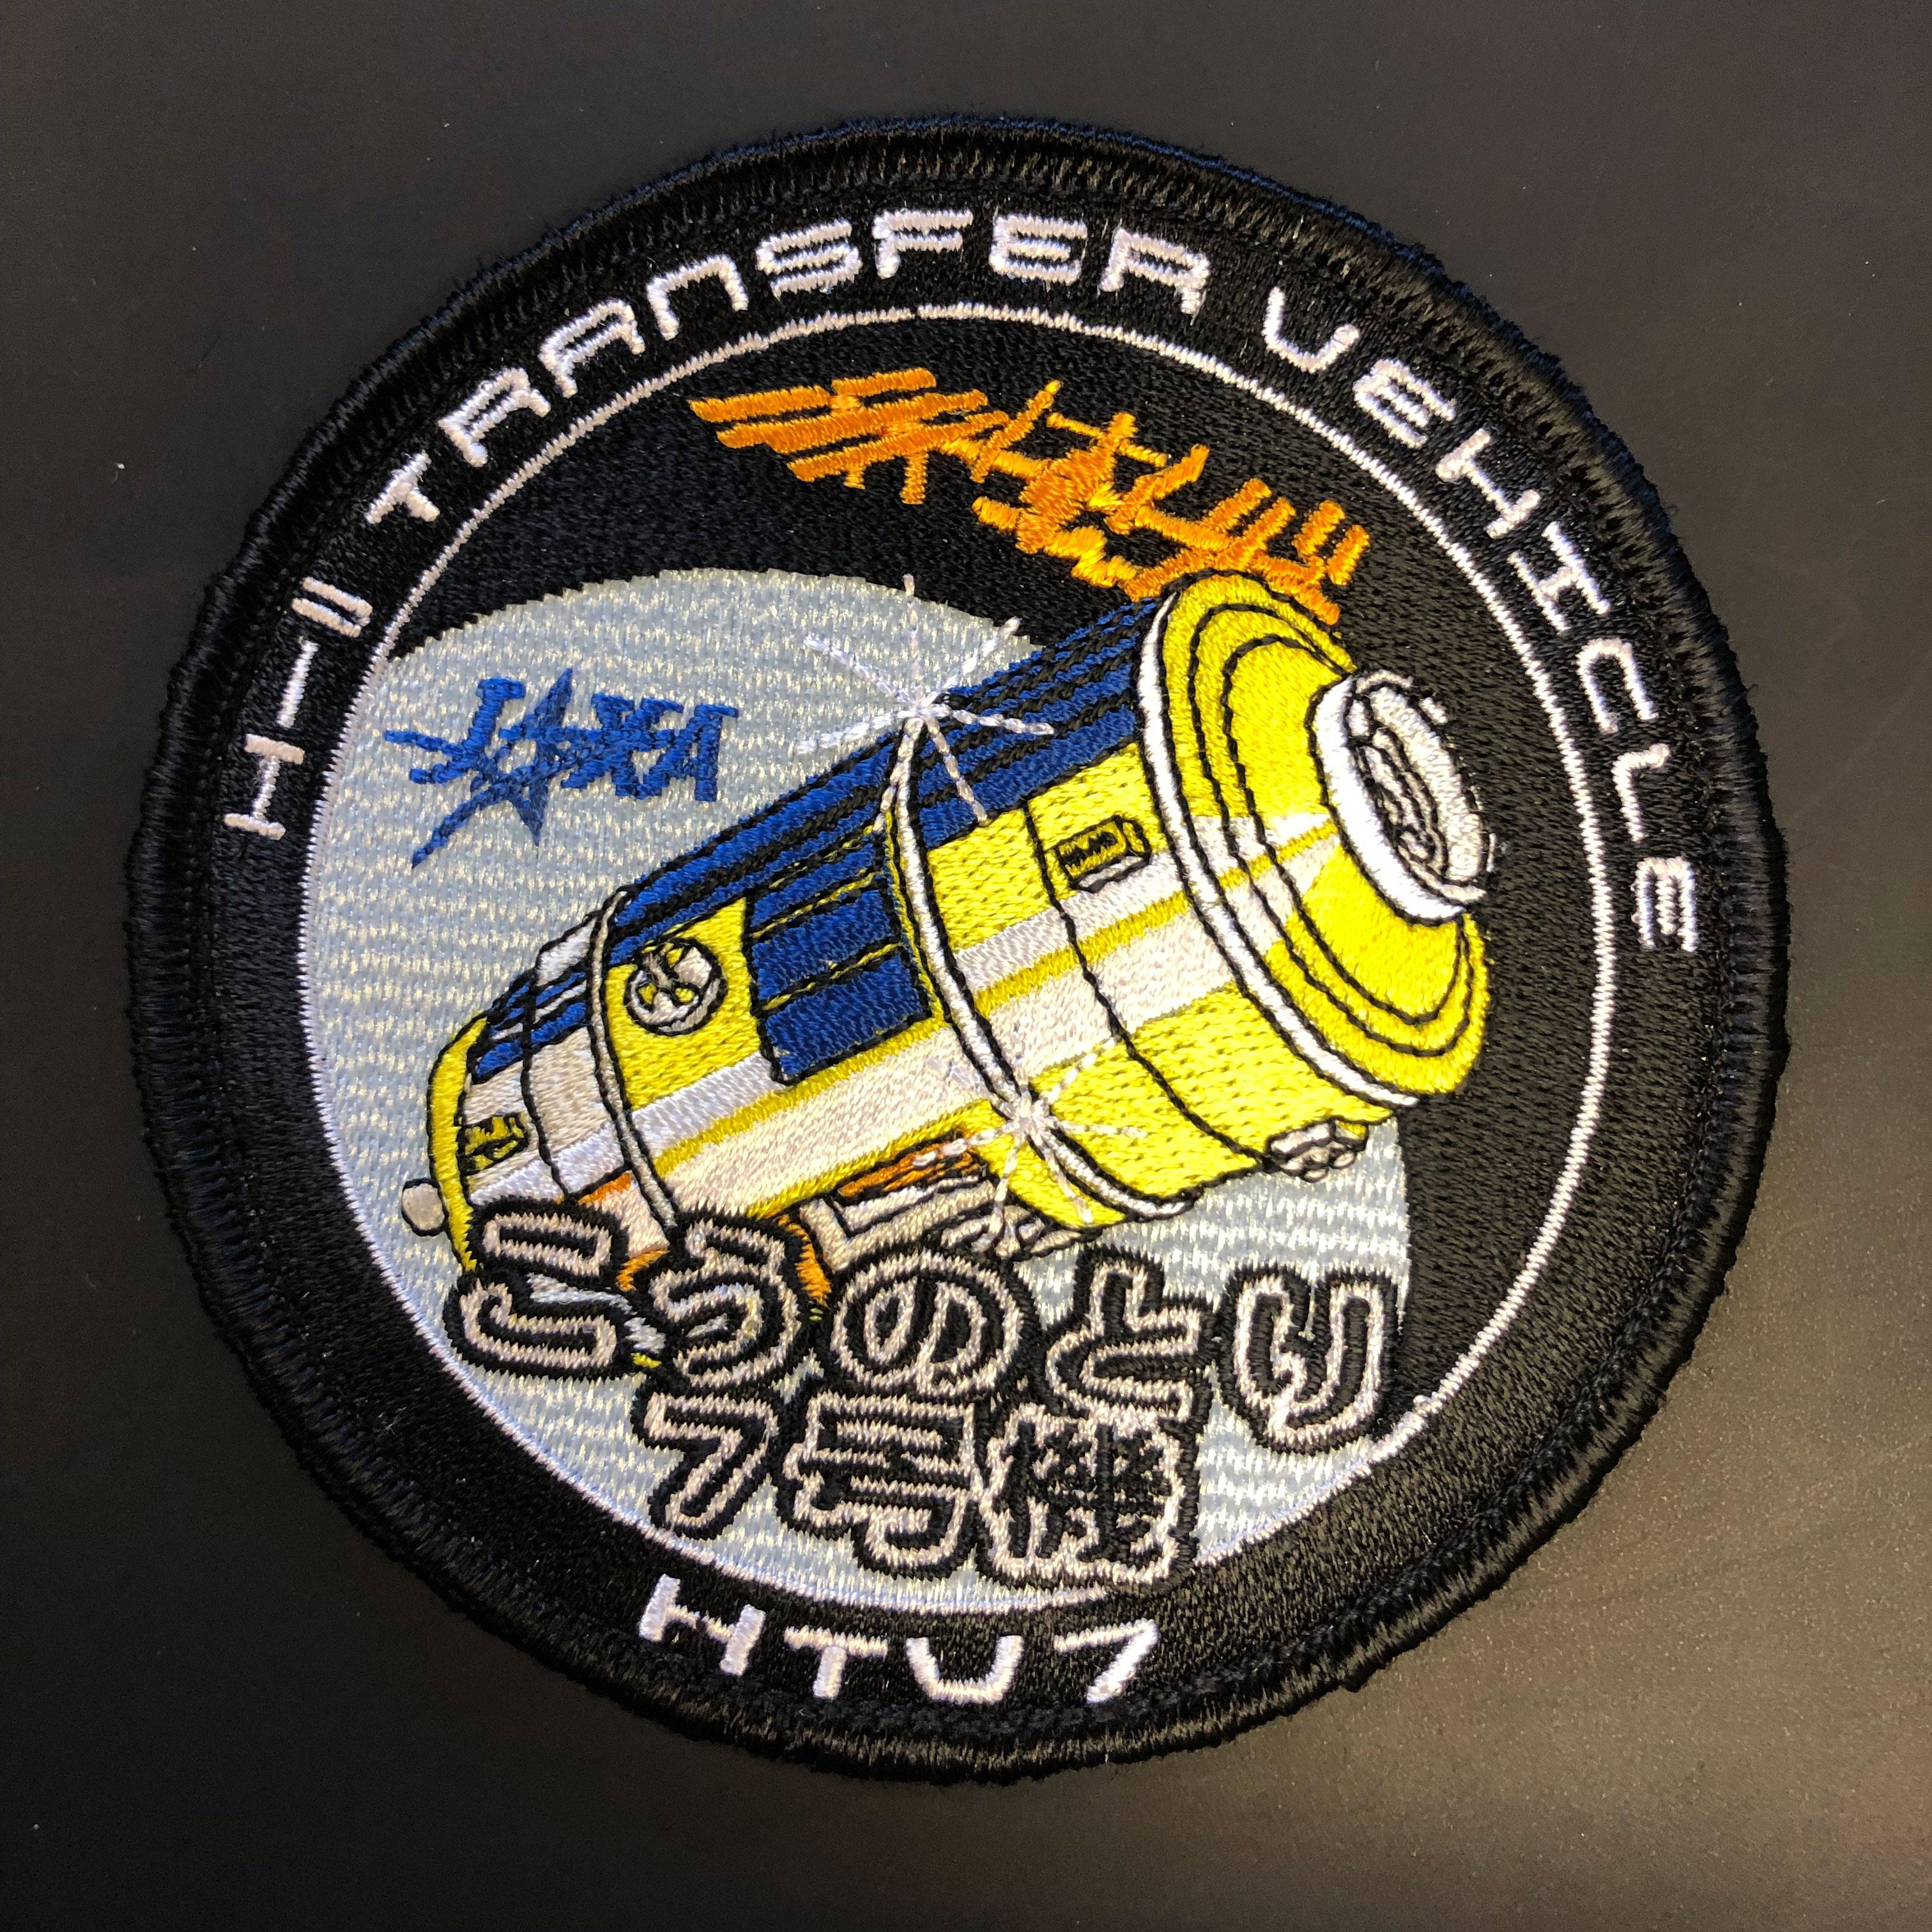 JAXA's H-II Transfer Vehicle-7 (HTV-7) logo - collectSPACE